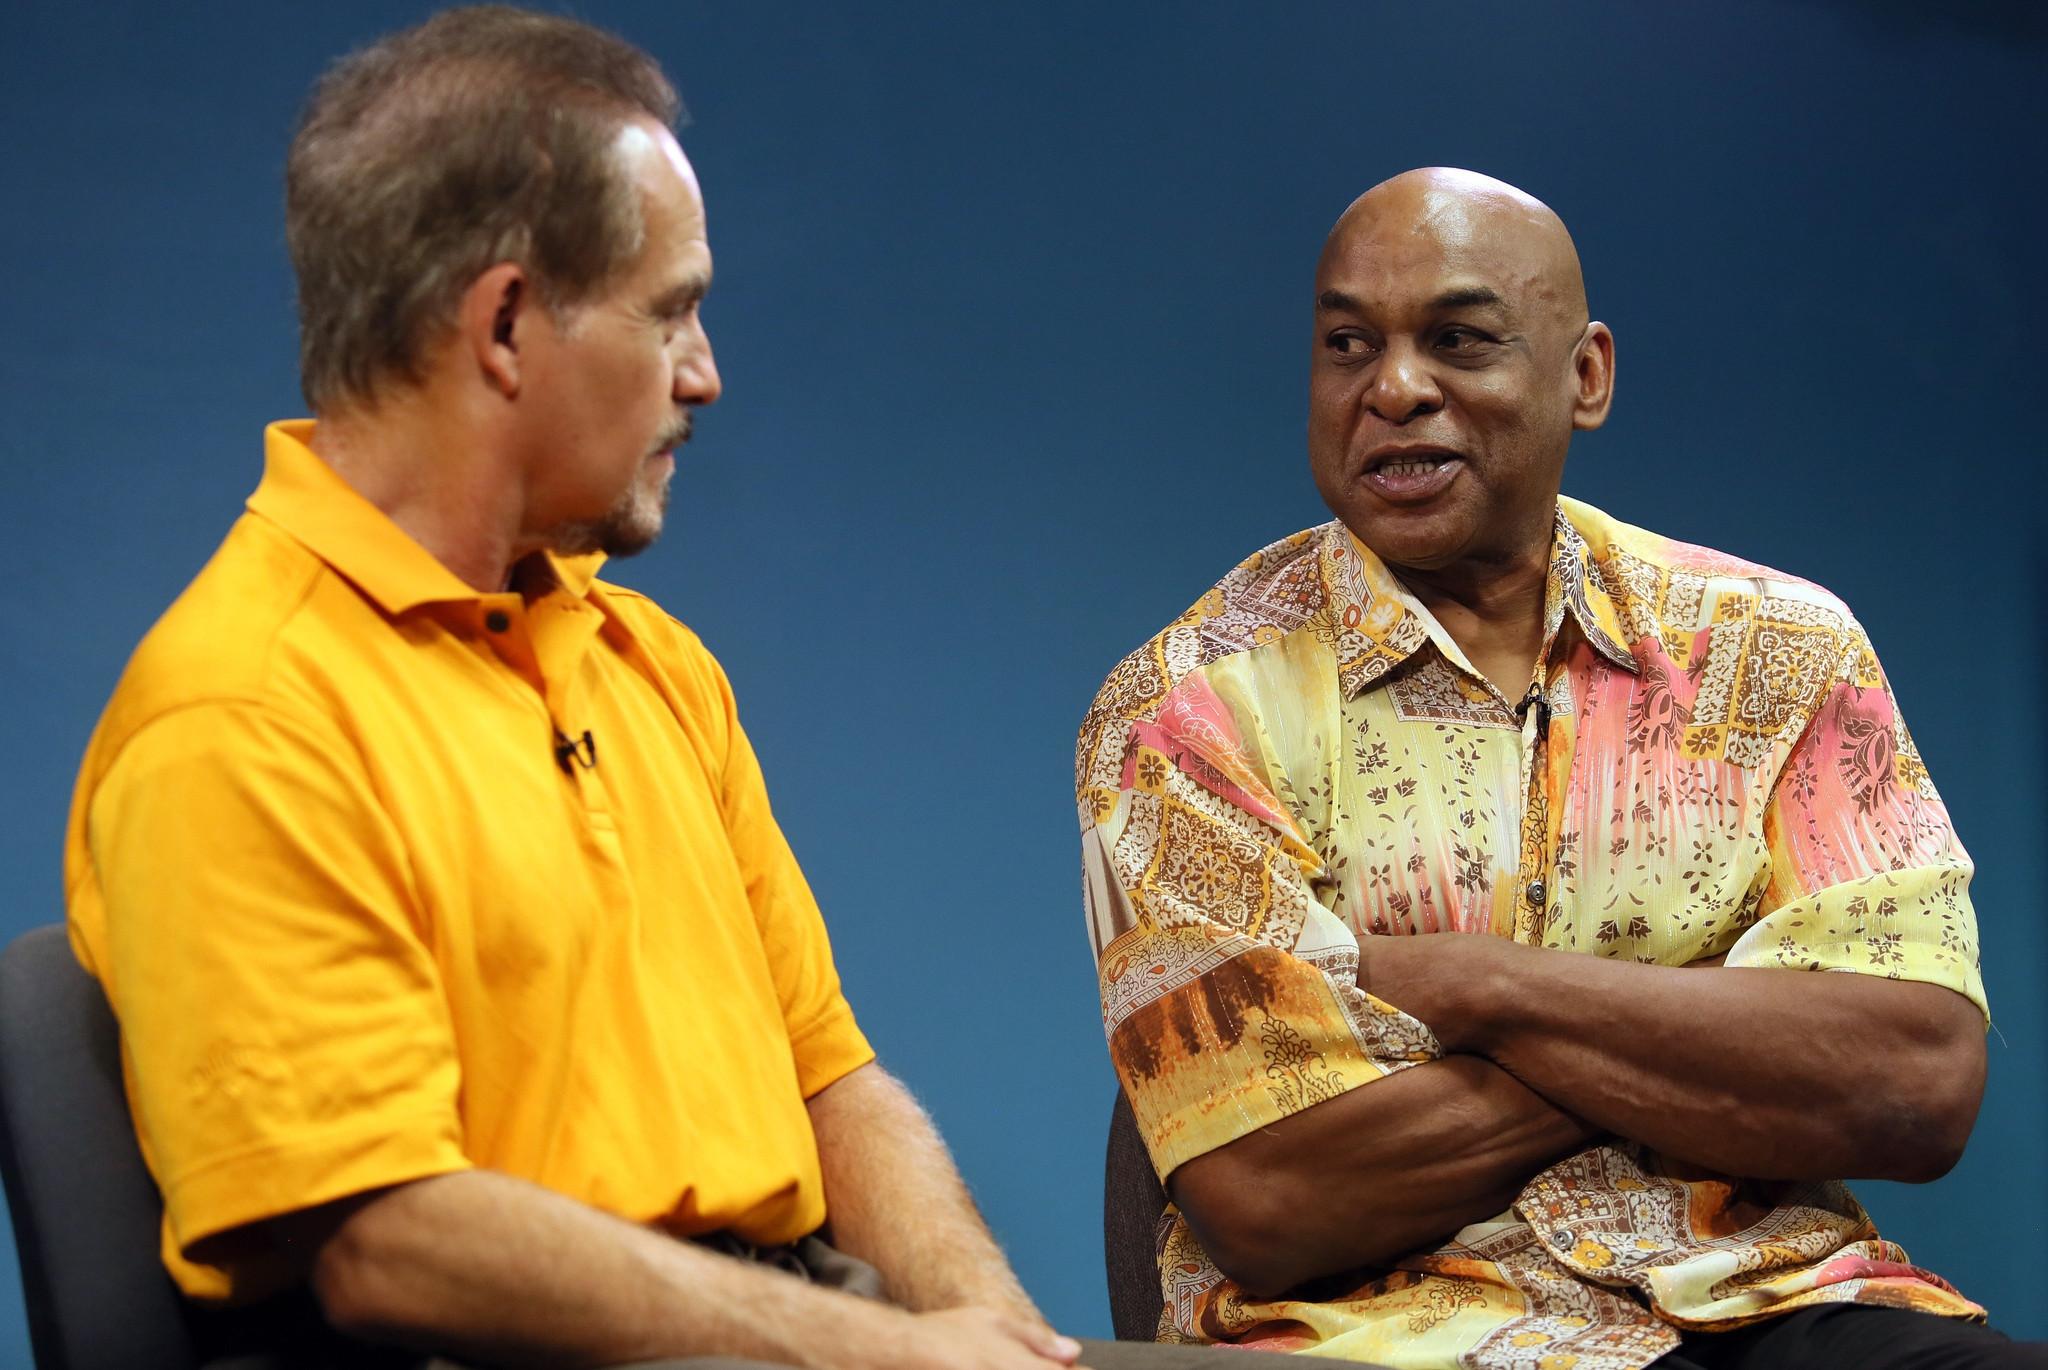 Reggie Williams former Cincinnati Bengals linebacker no longer